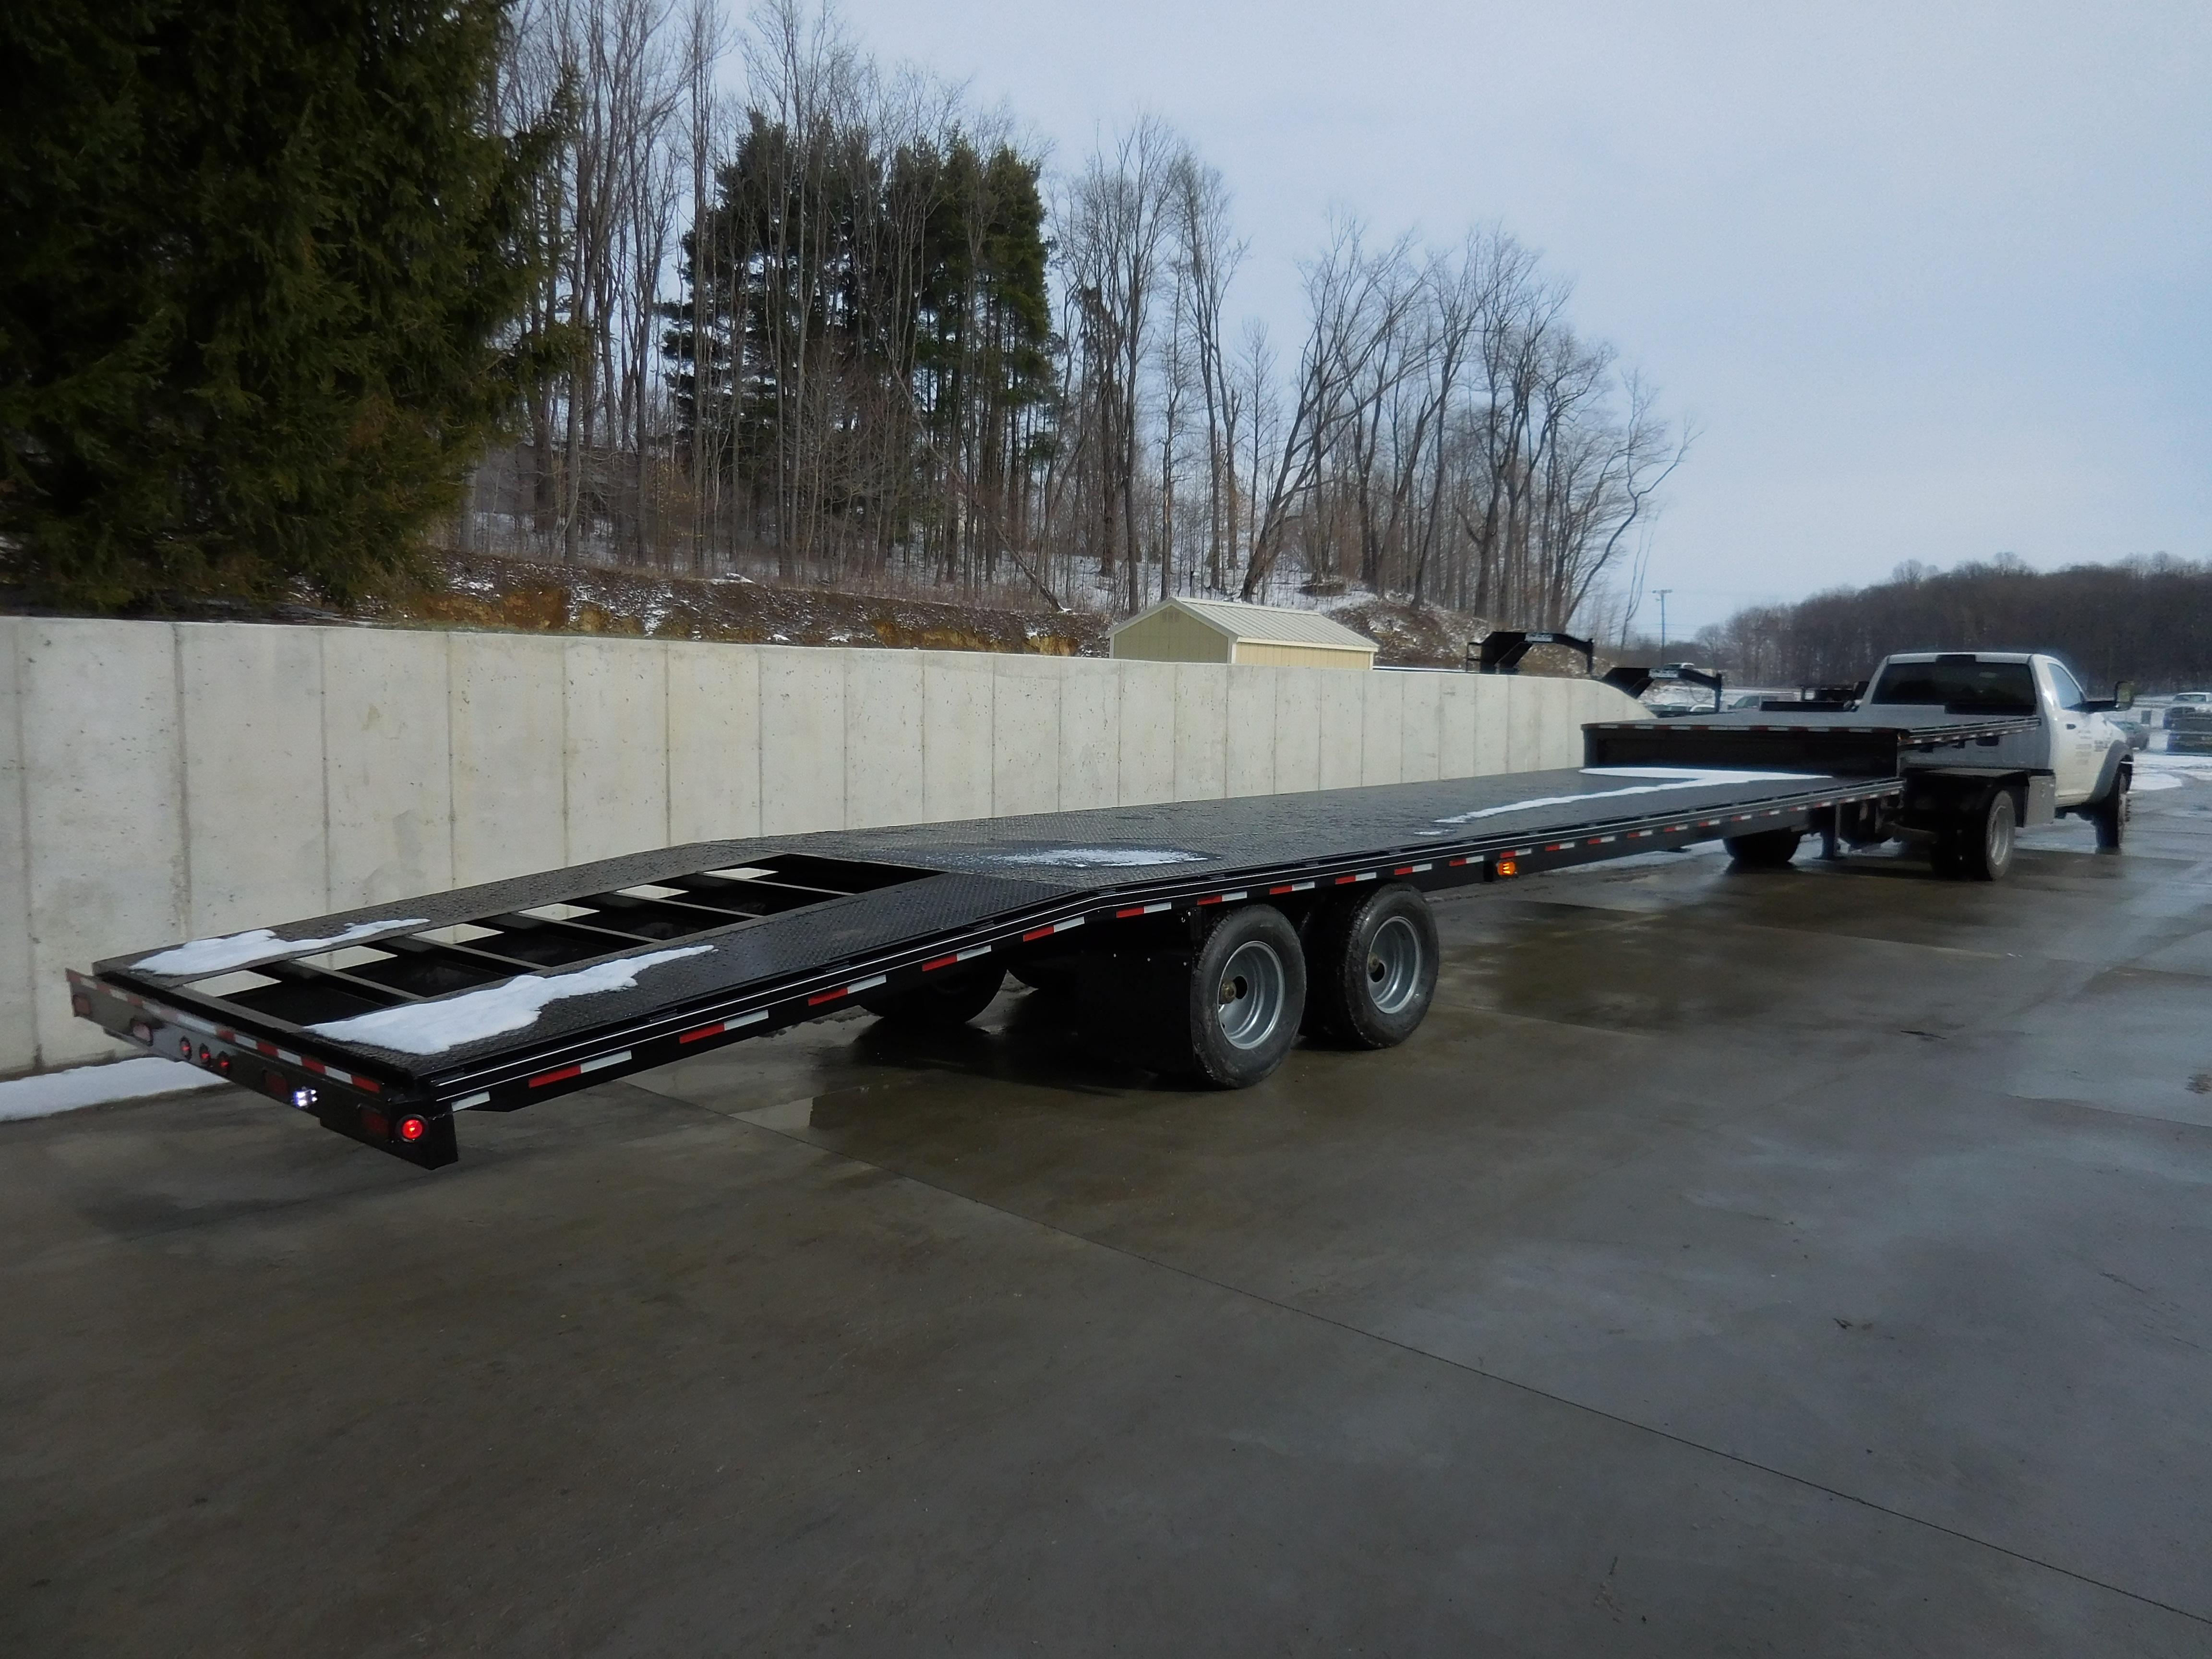 Step Deck Trailer >> Step Deck Car Trailer Appalachian Appalachian Trailers